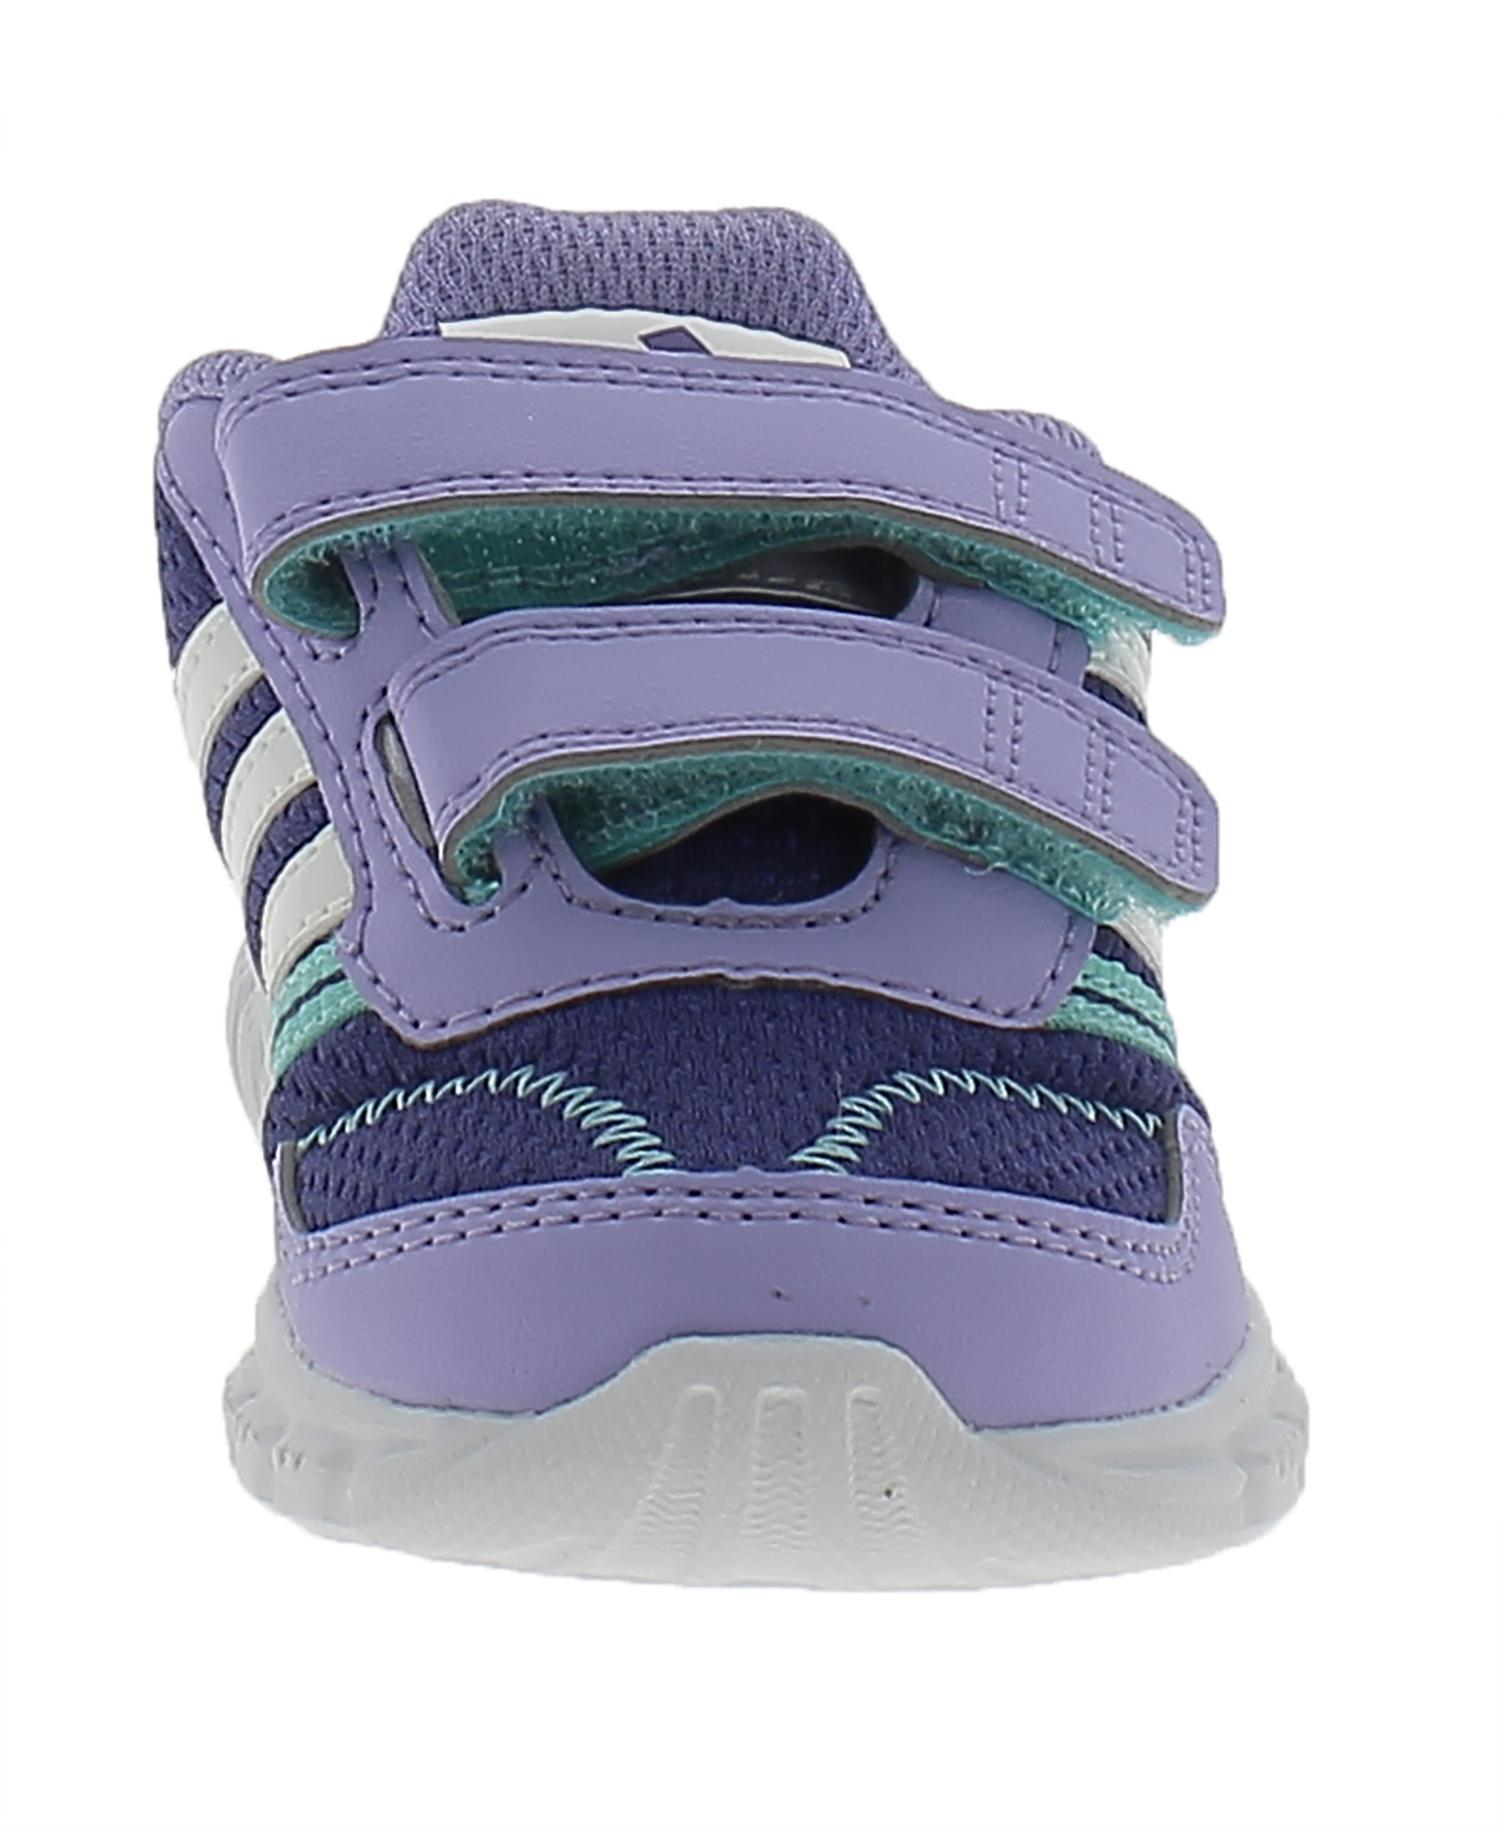 adidas adidas a-faito lt cf i scarpe bambina viola pelle strappi m20377